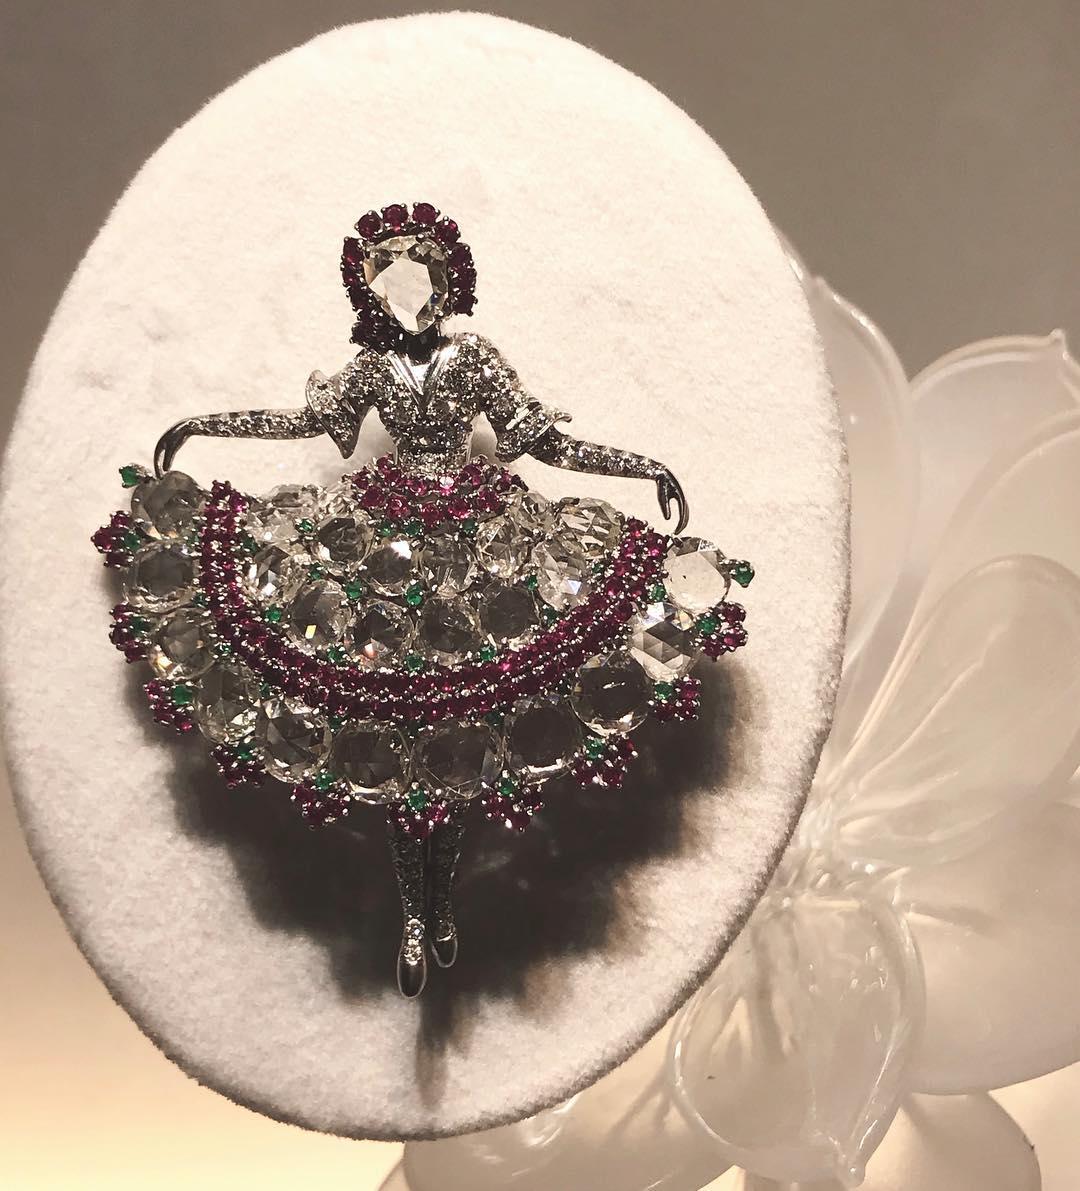 Dont miss the Precious Ballerinas exhibition @vancleefarpels boutique. Did you know? Claude Arpels created the first ballerina in America in 1941. #degasinspired  ___________ @christelkado @aurelie_bonkowski @vancleefarpels @catherine_cariou #preciousballerinas #placevendome #vancleefandarpels #vancleefinamerica #nyc #americanlover???????? #balletdancer @museeorsay #degasexhibition #degasworld